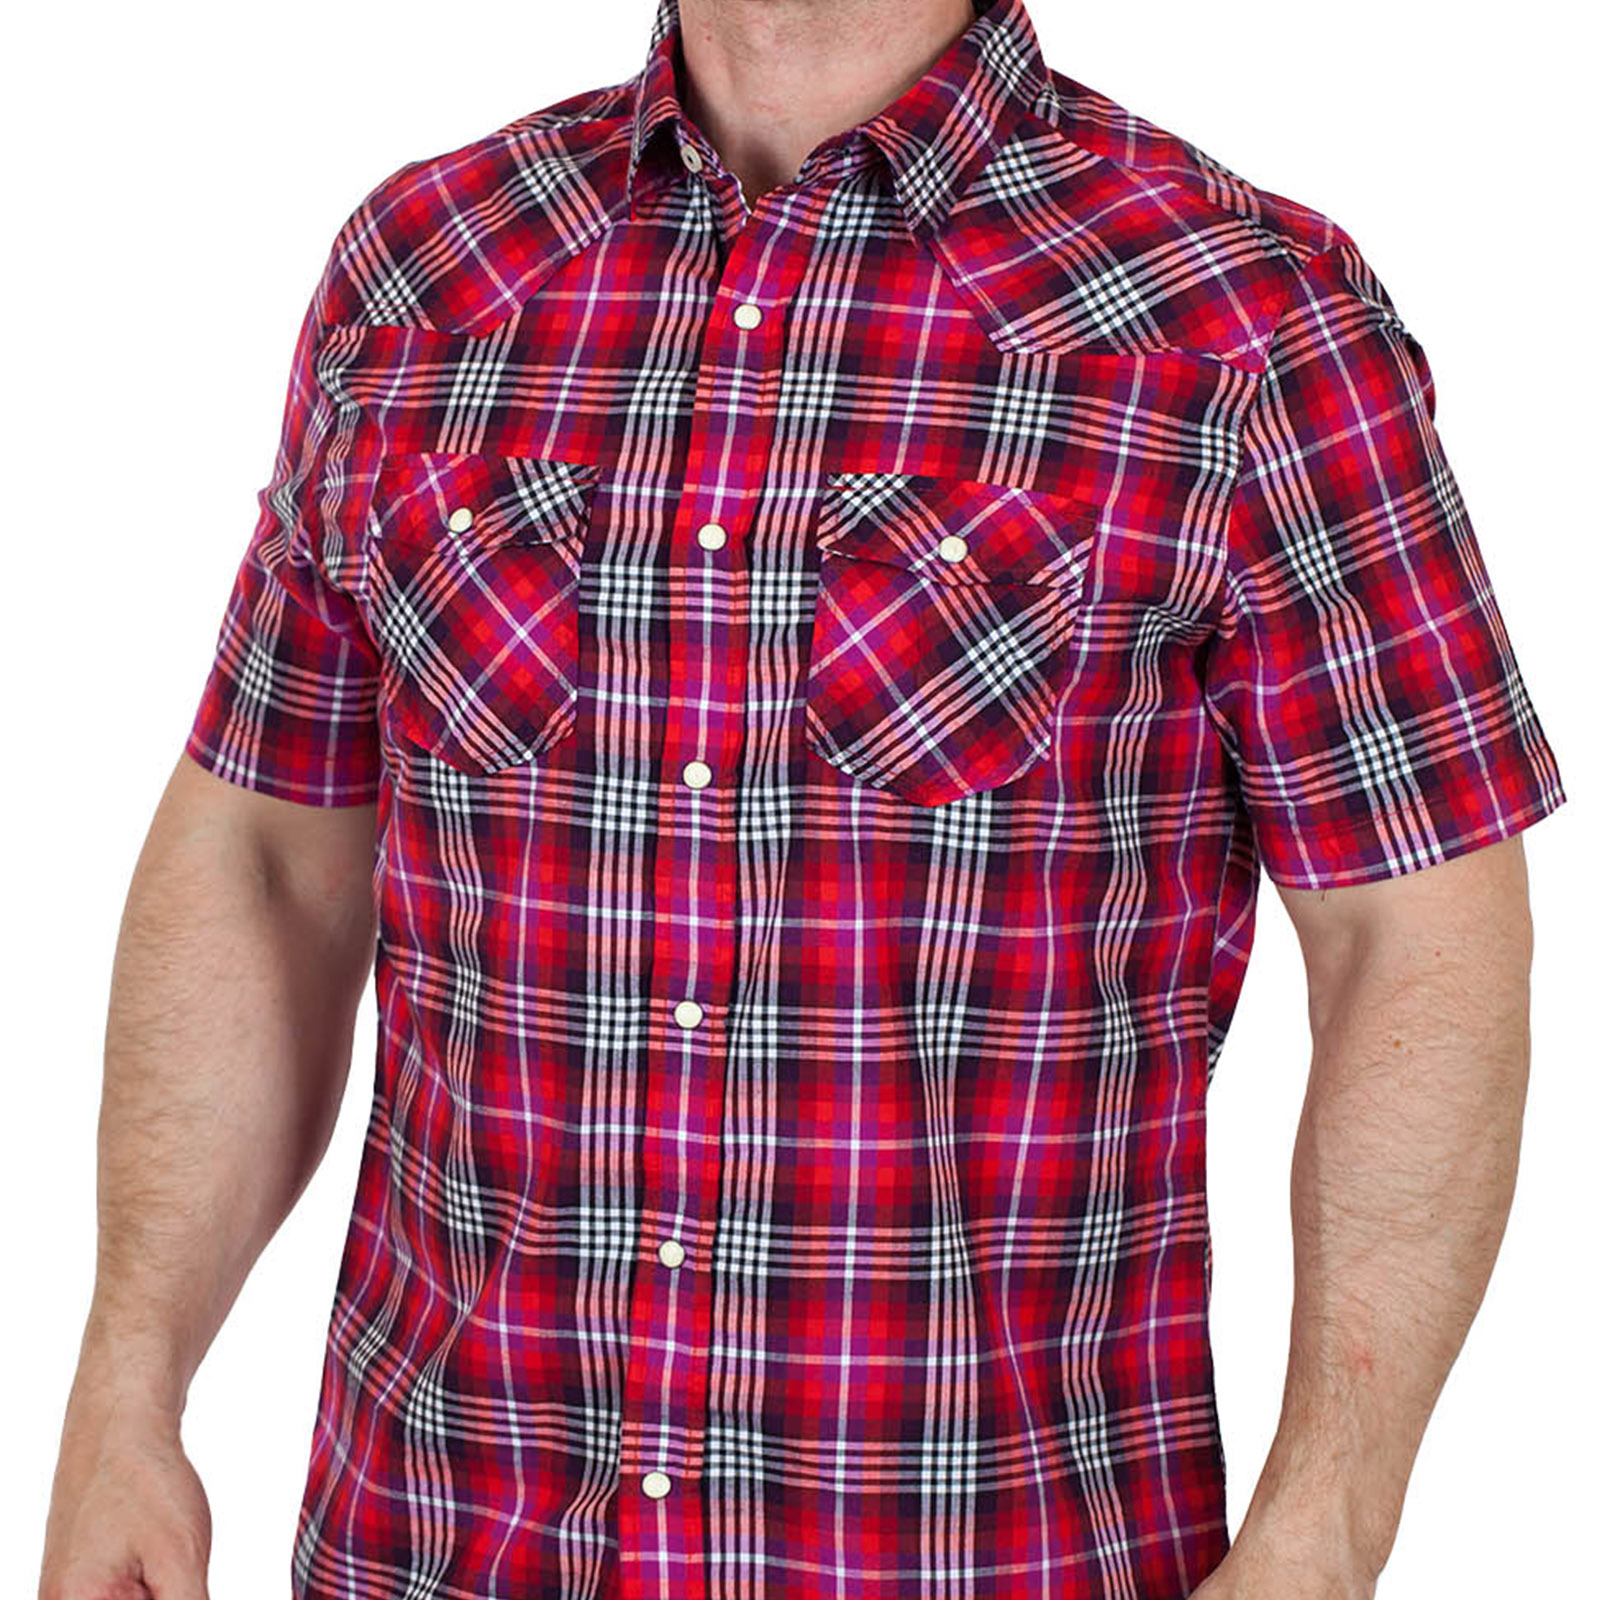 Трендовая мужская рубашка Aeropostale - вид спереди